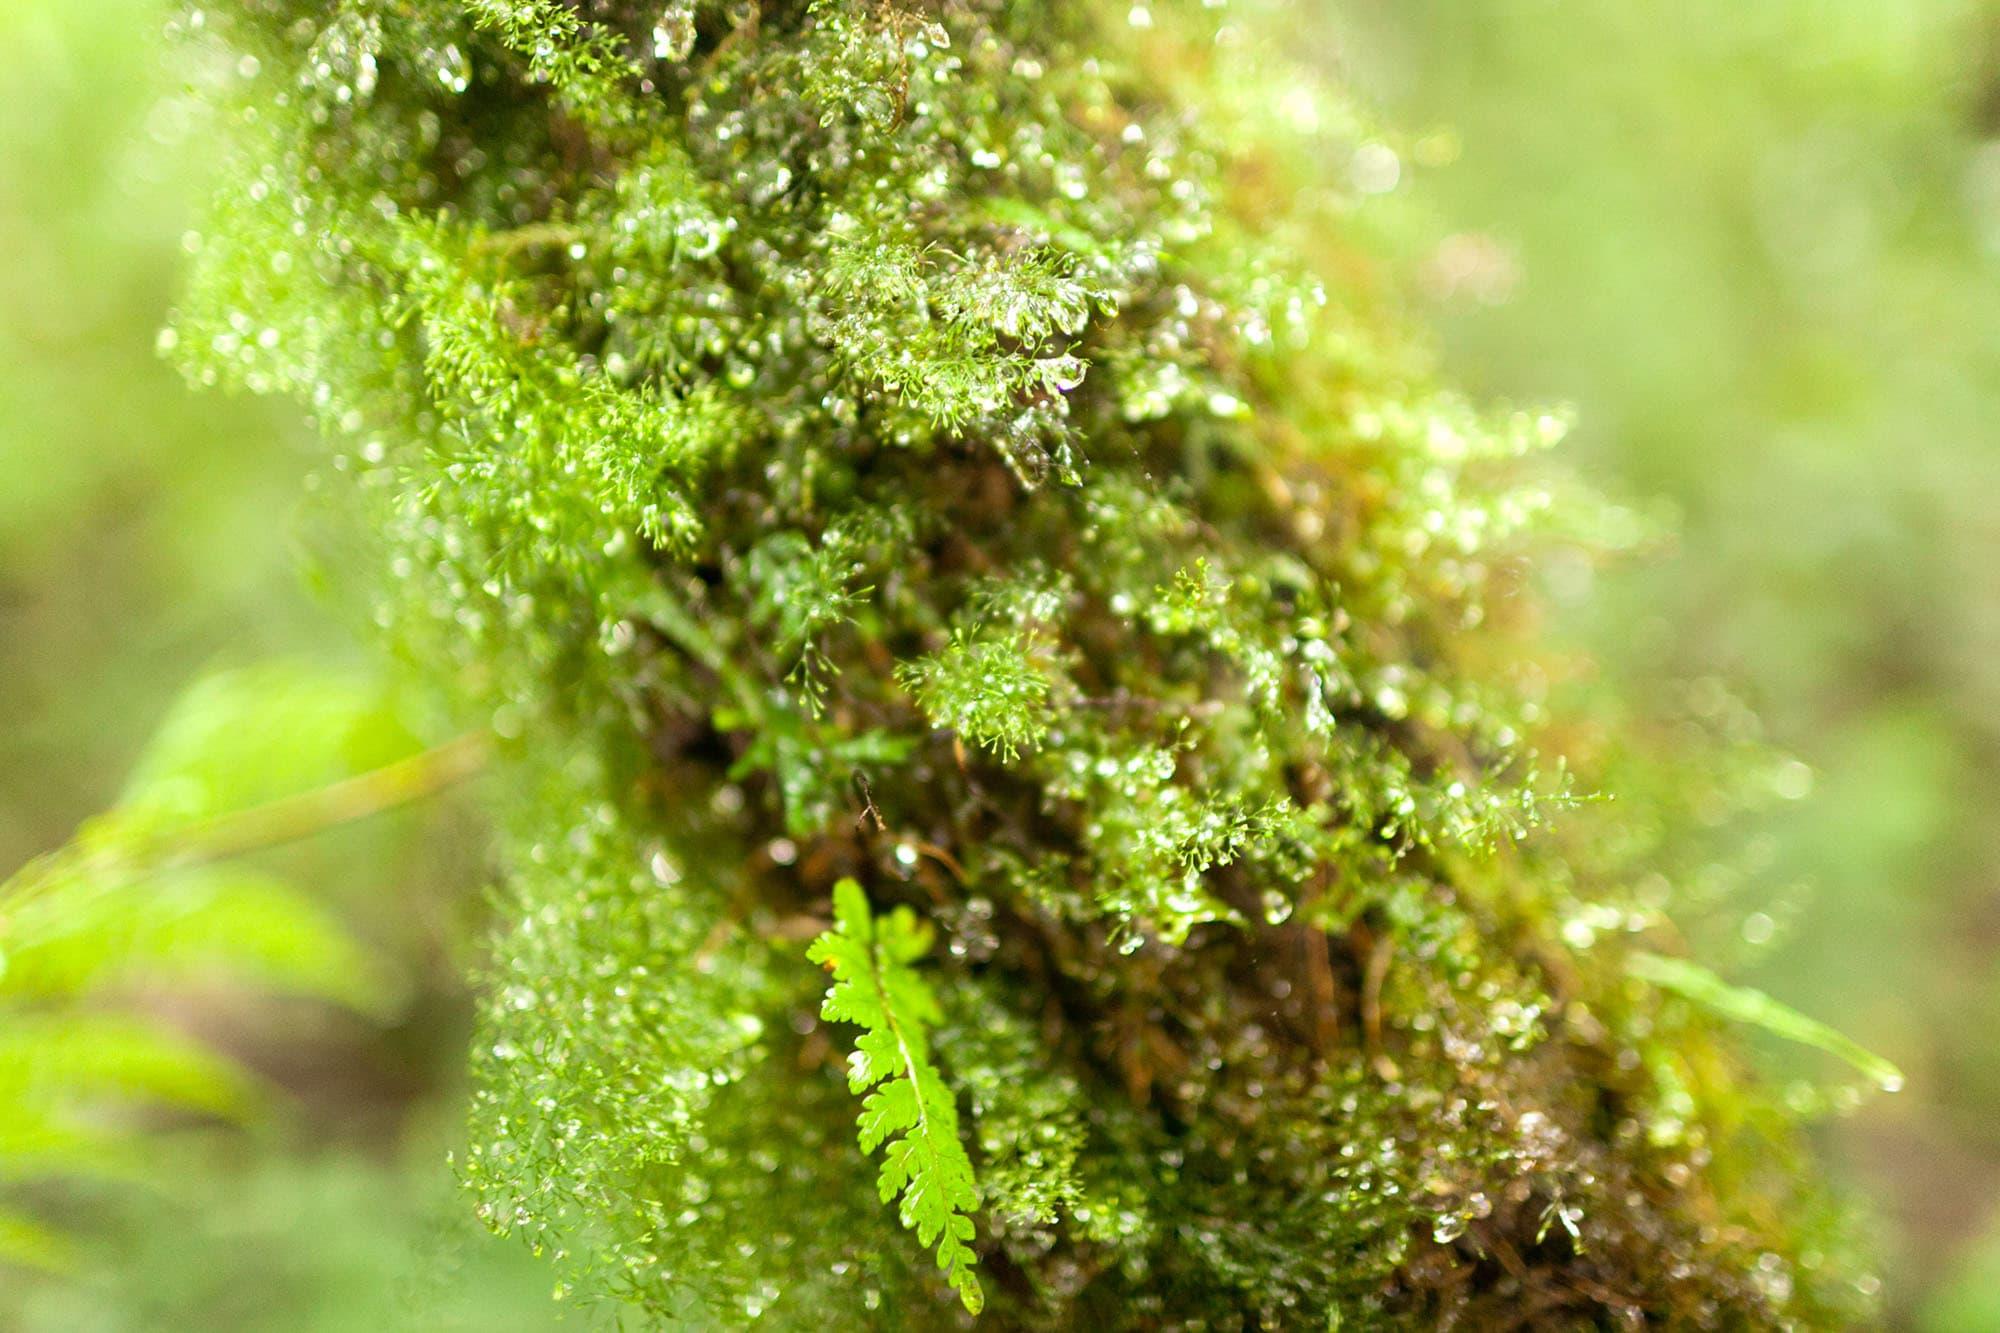 Monteverde Cloud Forest Reserve in Costa Rica